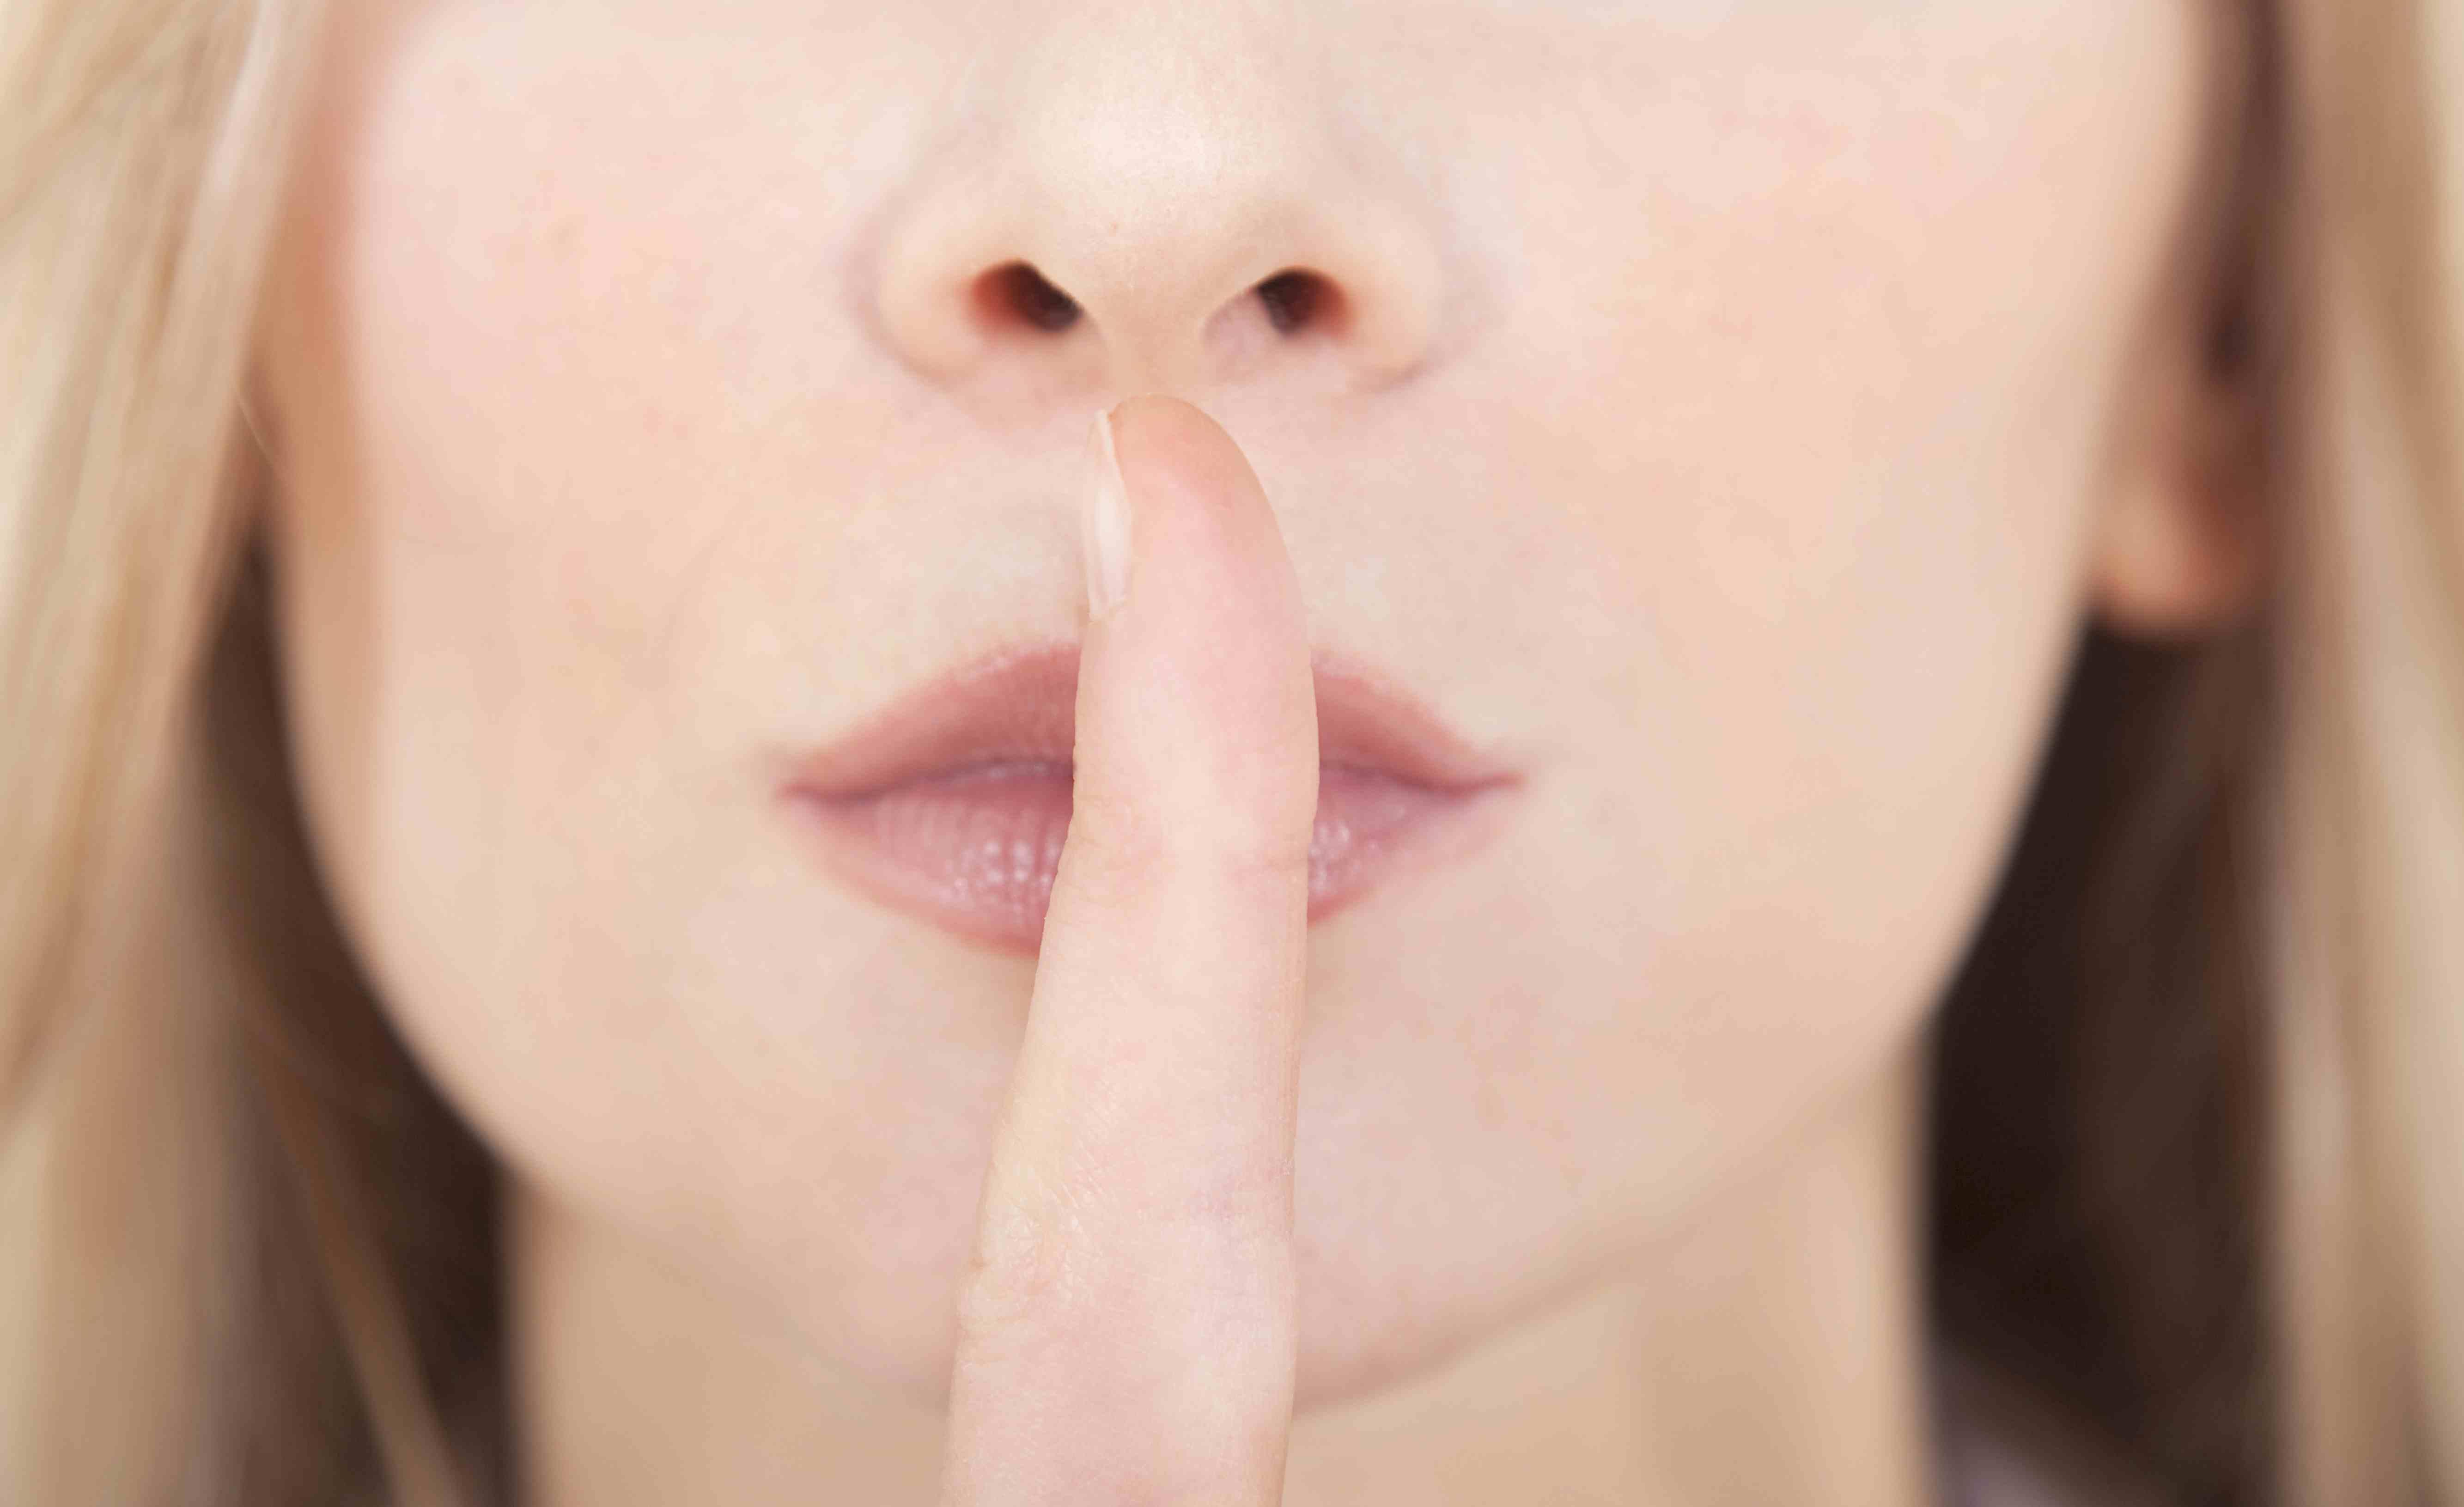 Woman saying shush